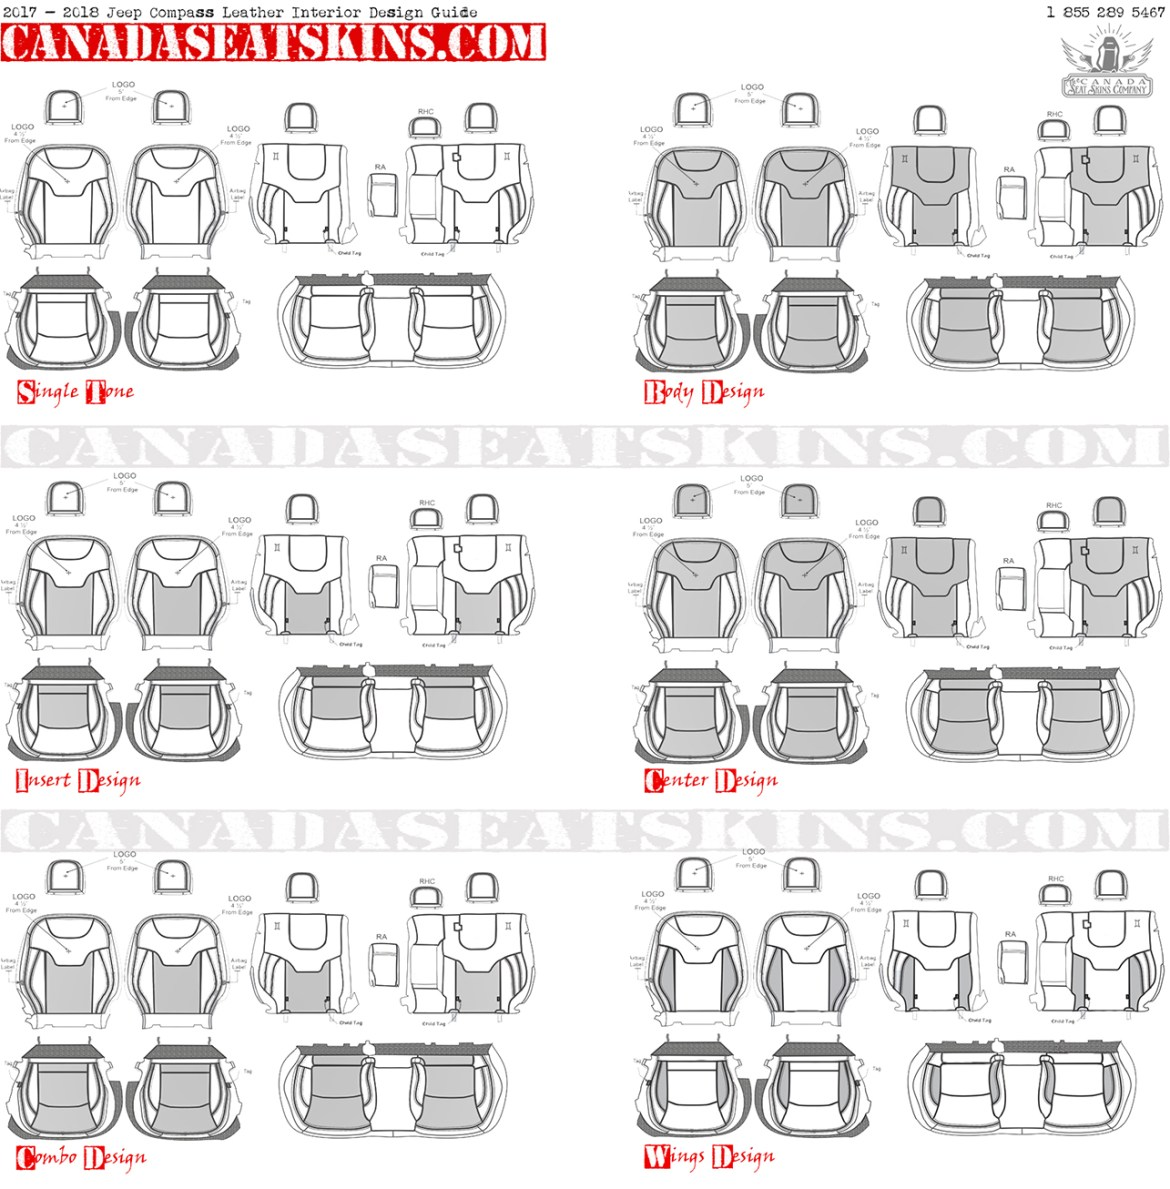 017 - 2018 Jeep Compass Leather Interior Design Guide